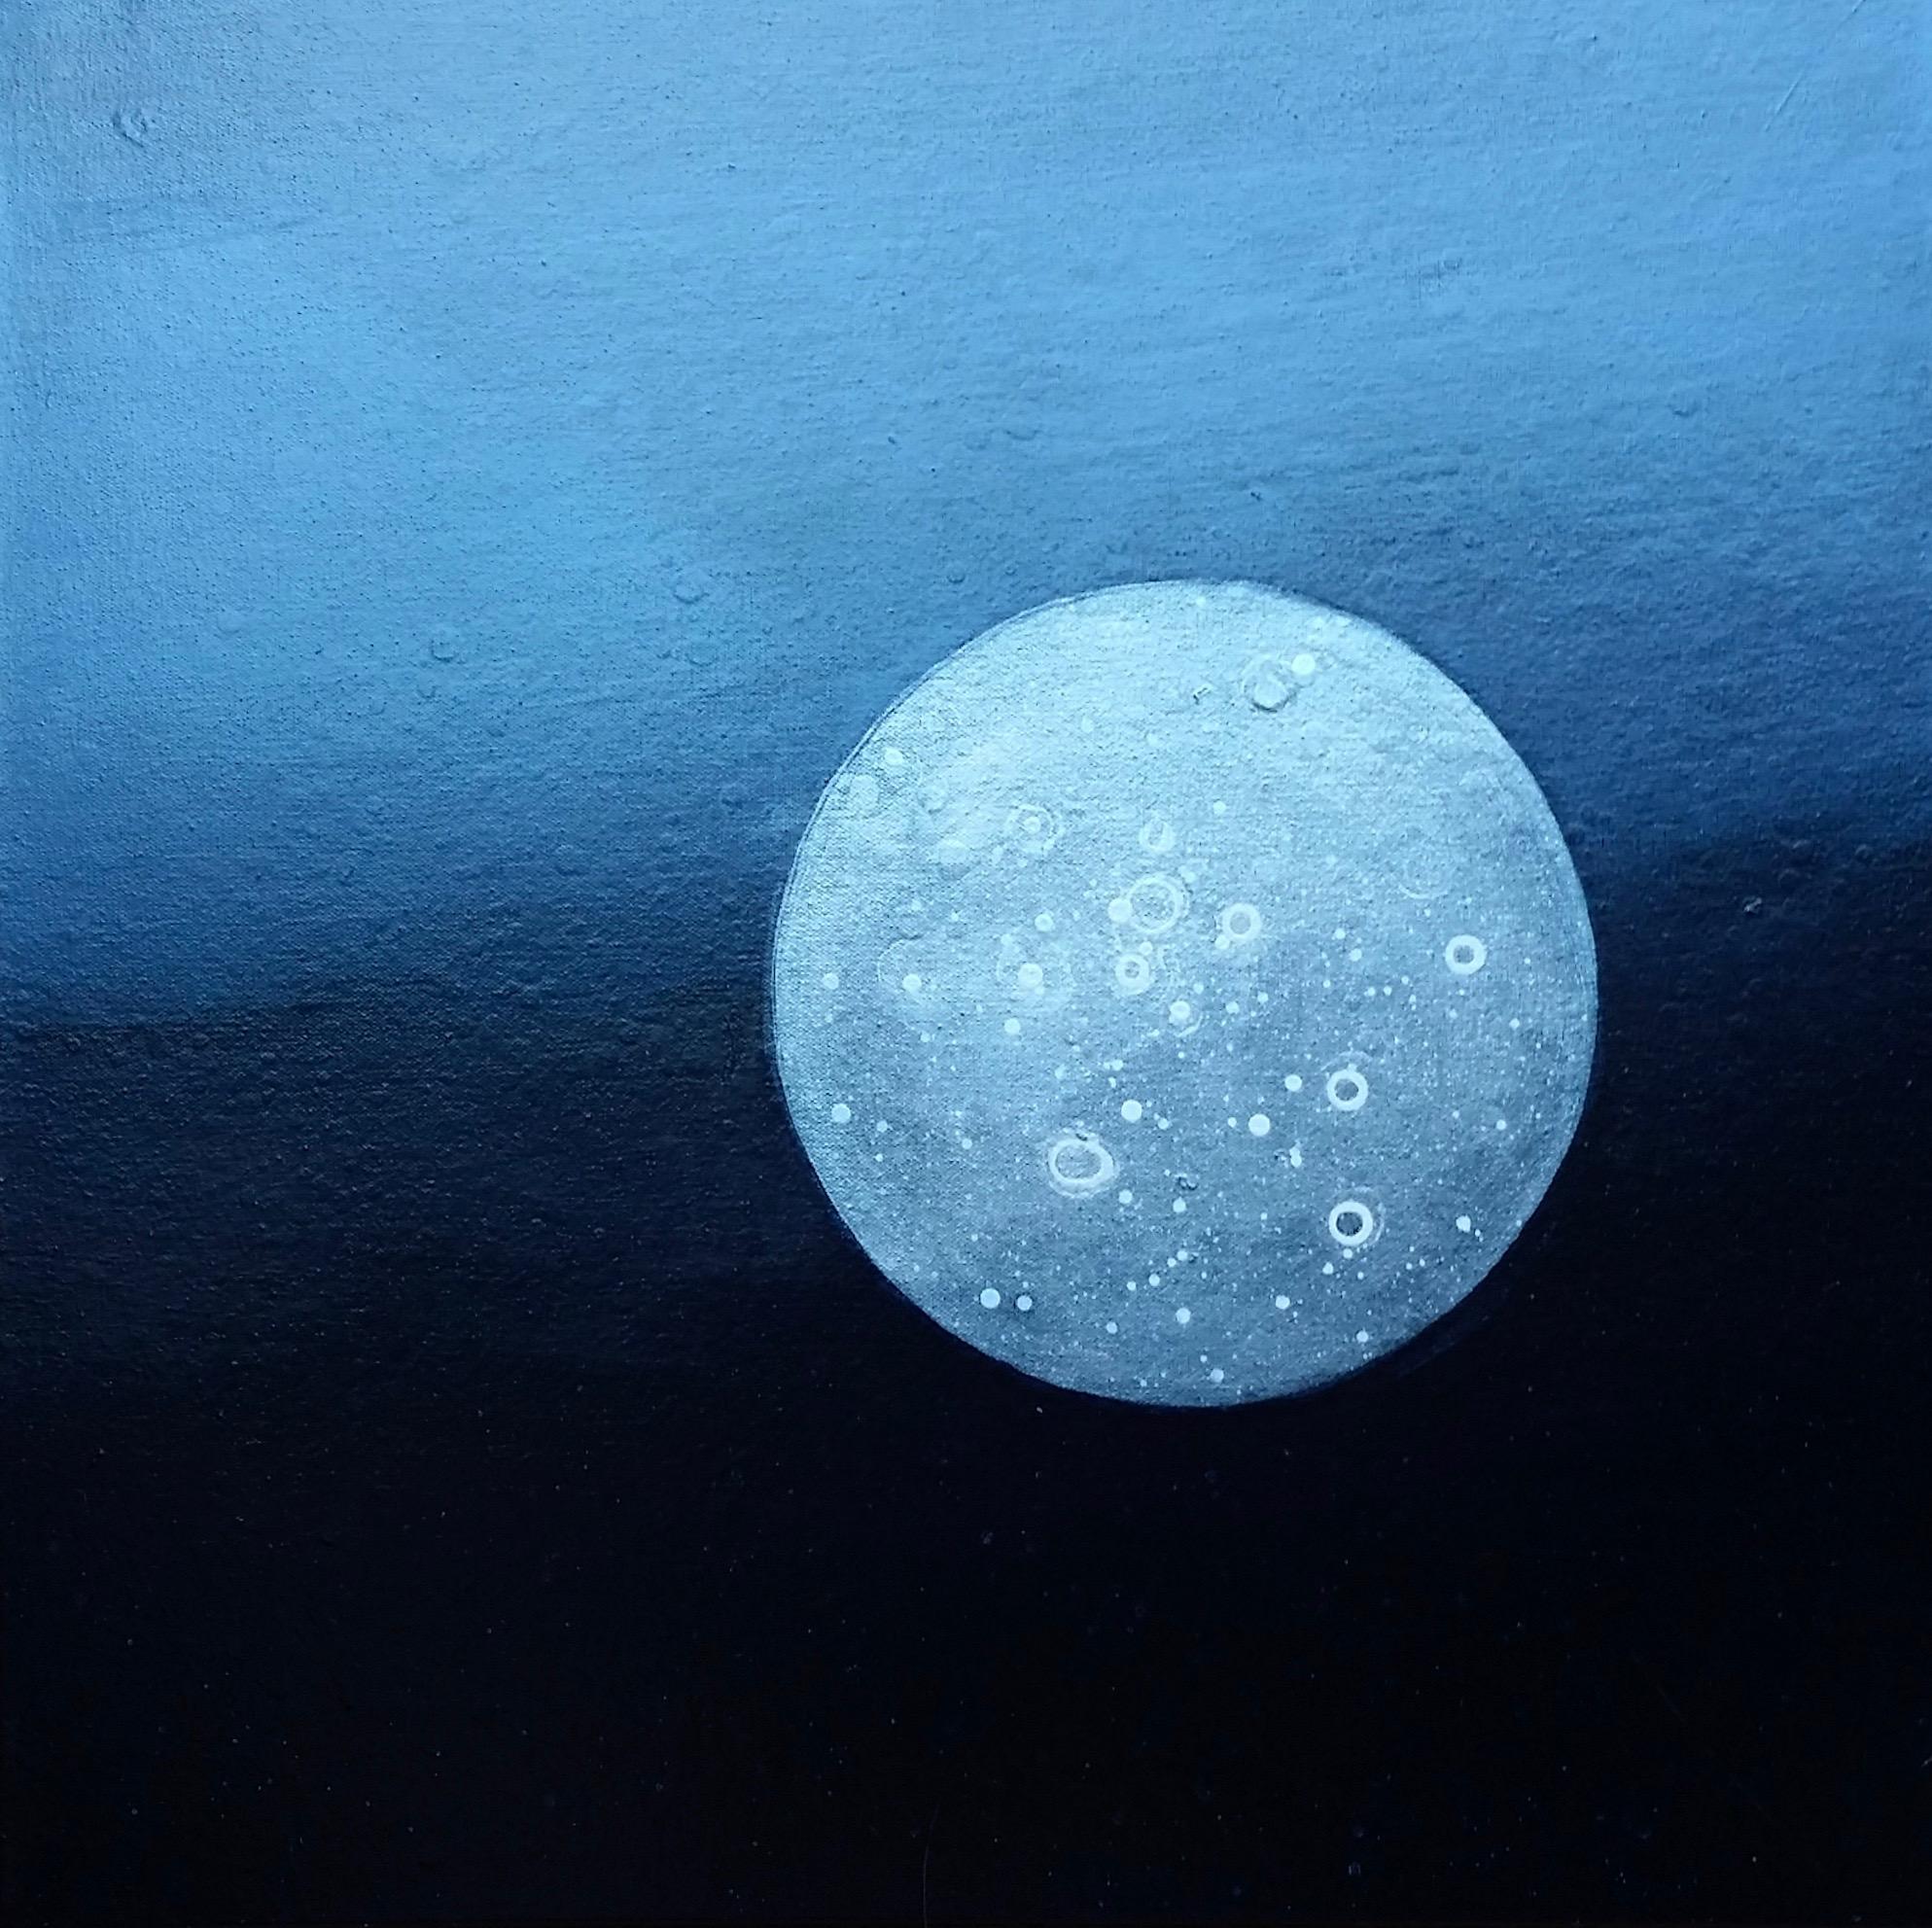 Moon, 2018  24 x 24 inches  Acrylic on canvas